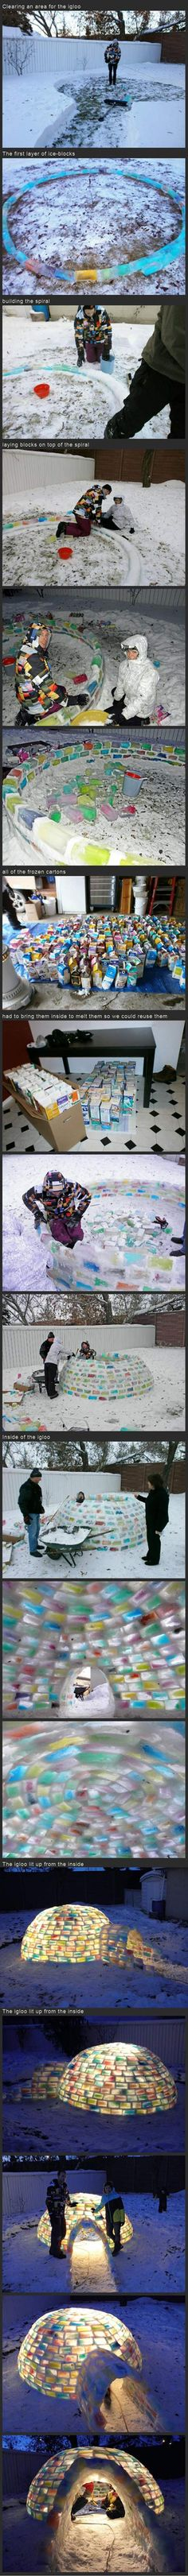 colourful backyard igloo